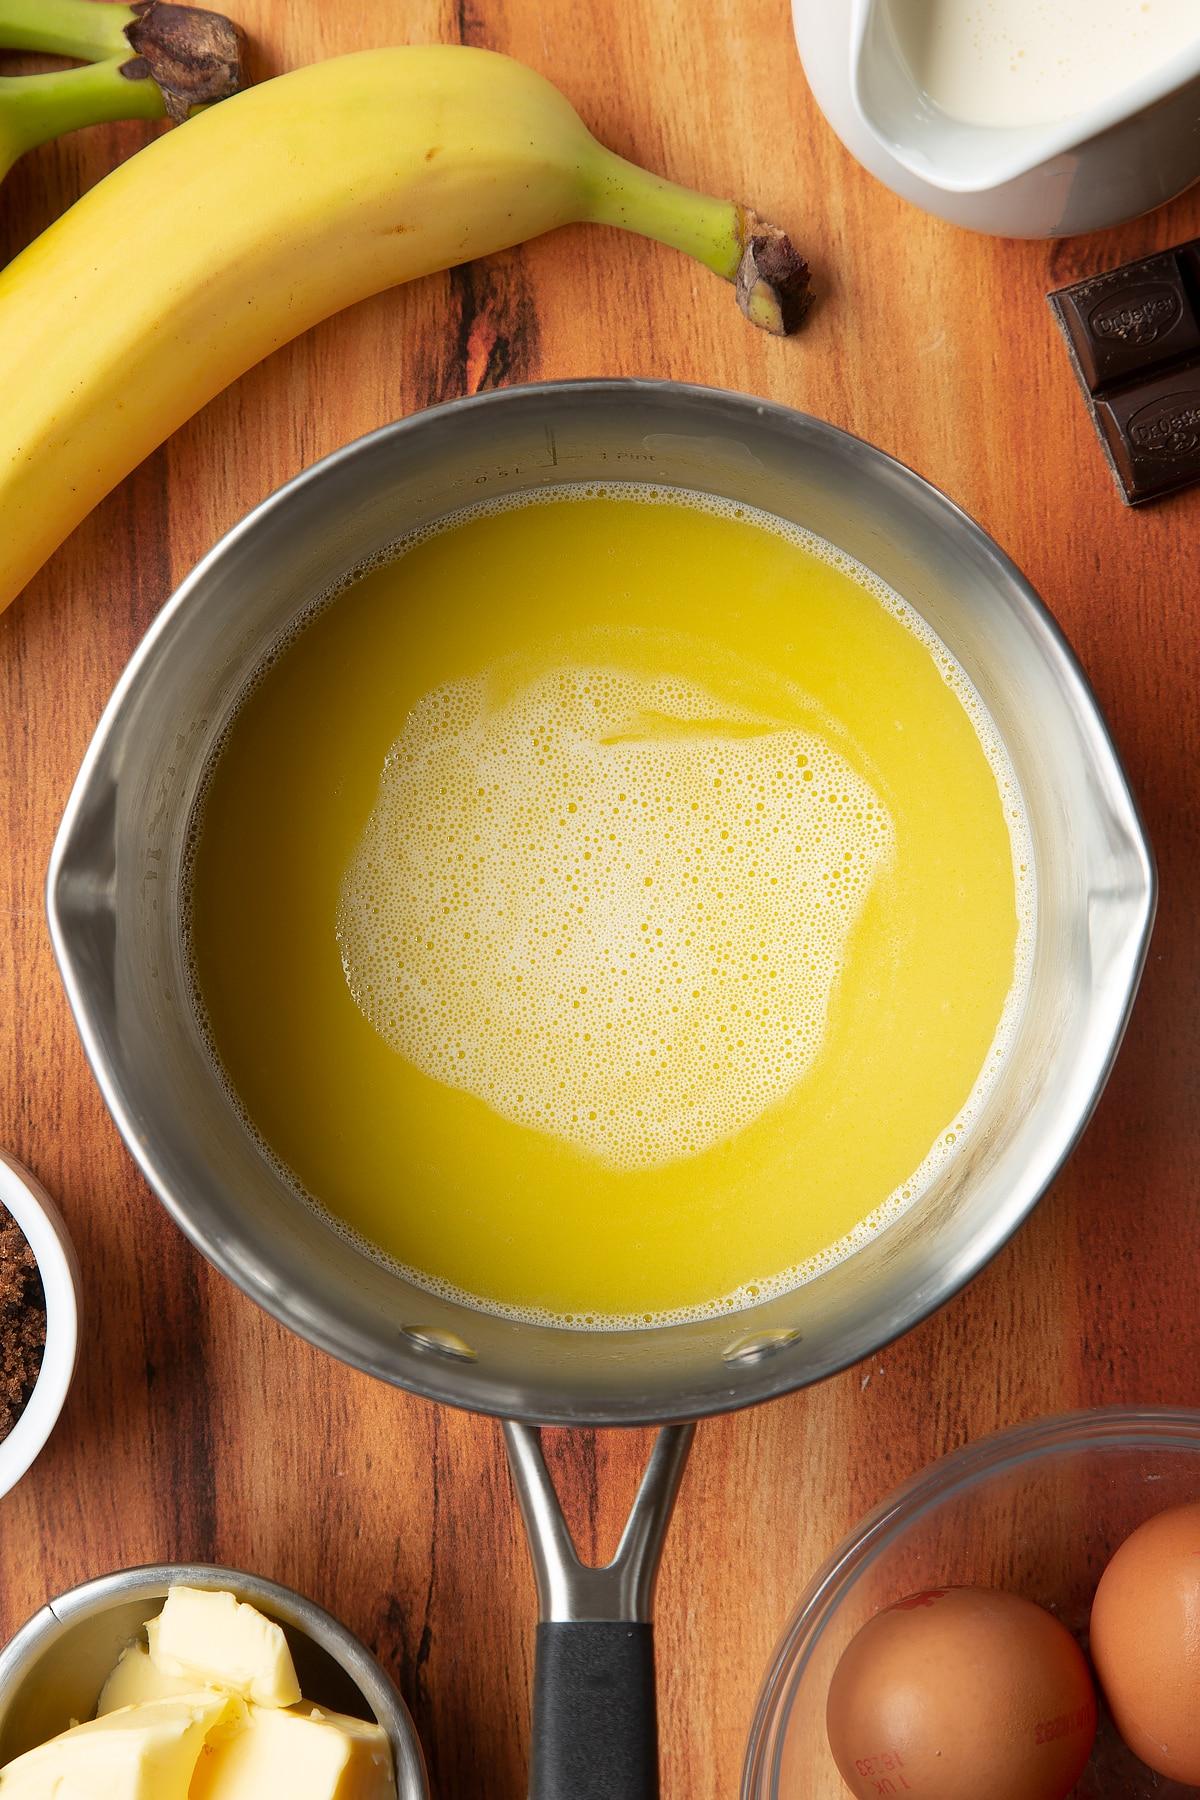 Overhead shot of butter liquid in a pan